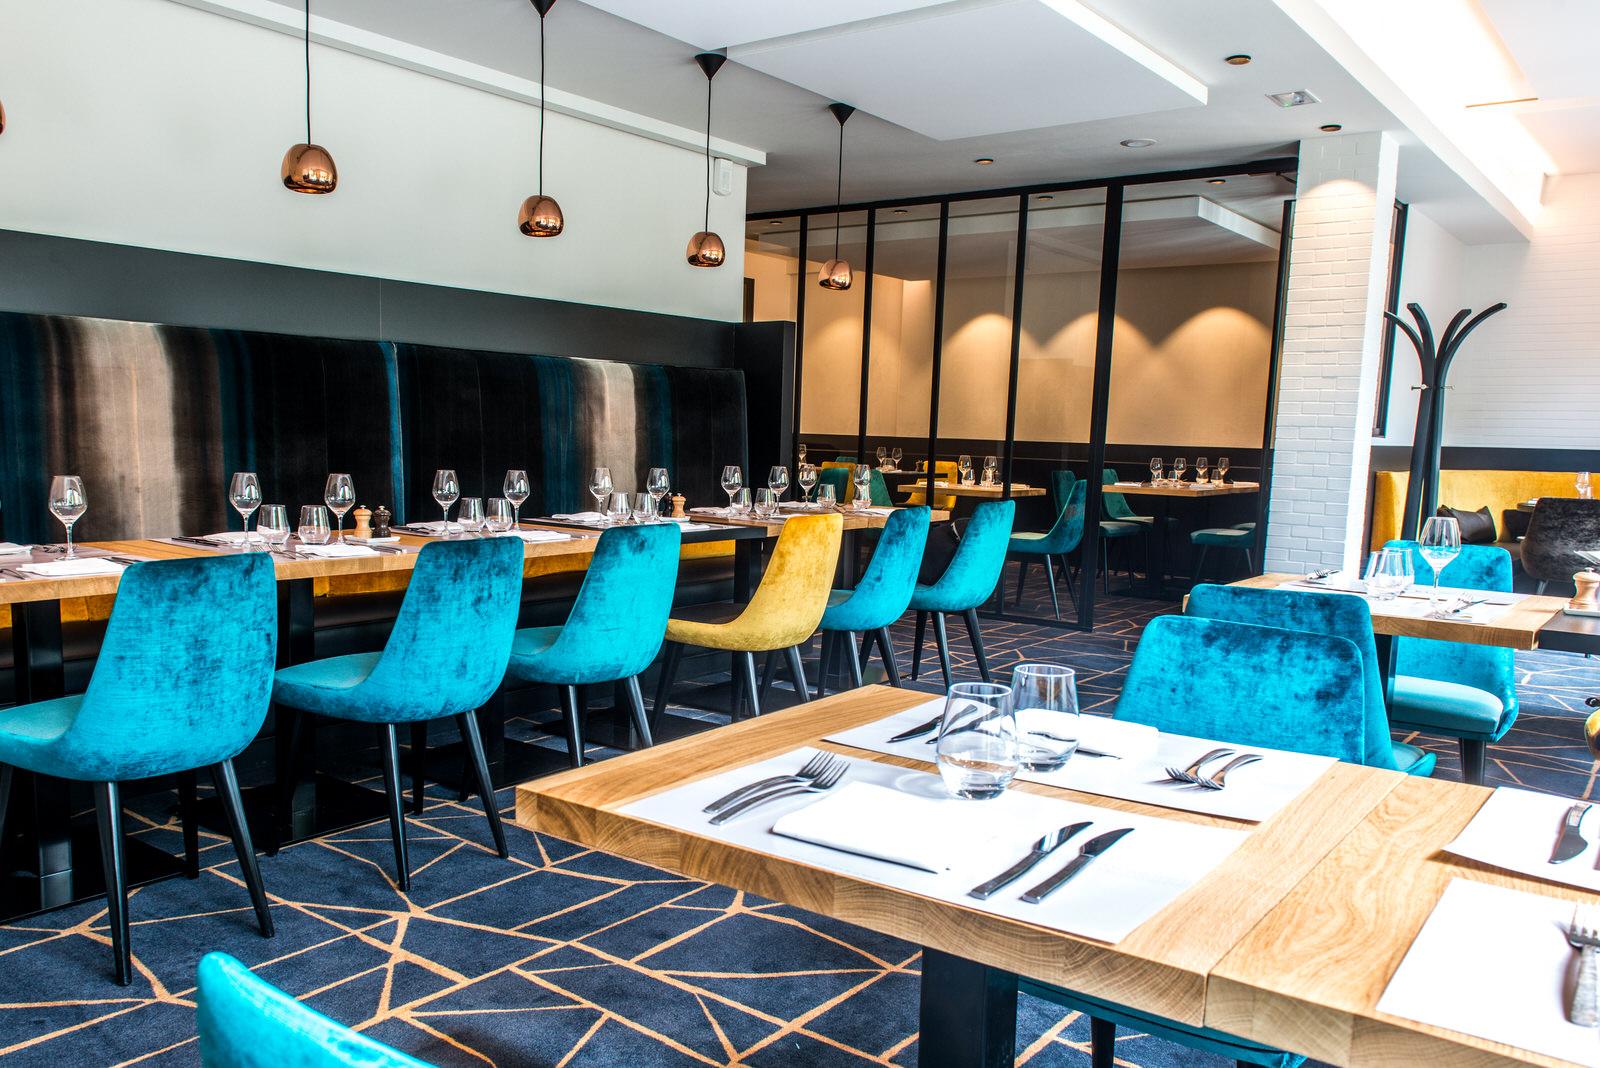 Avis Restaurant Caf Ef Bf Bd De La Paix